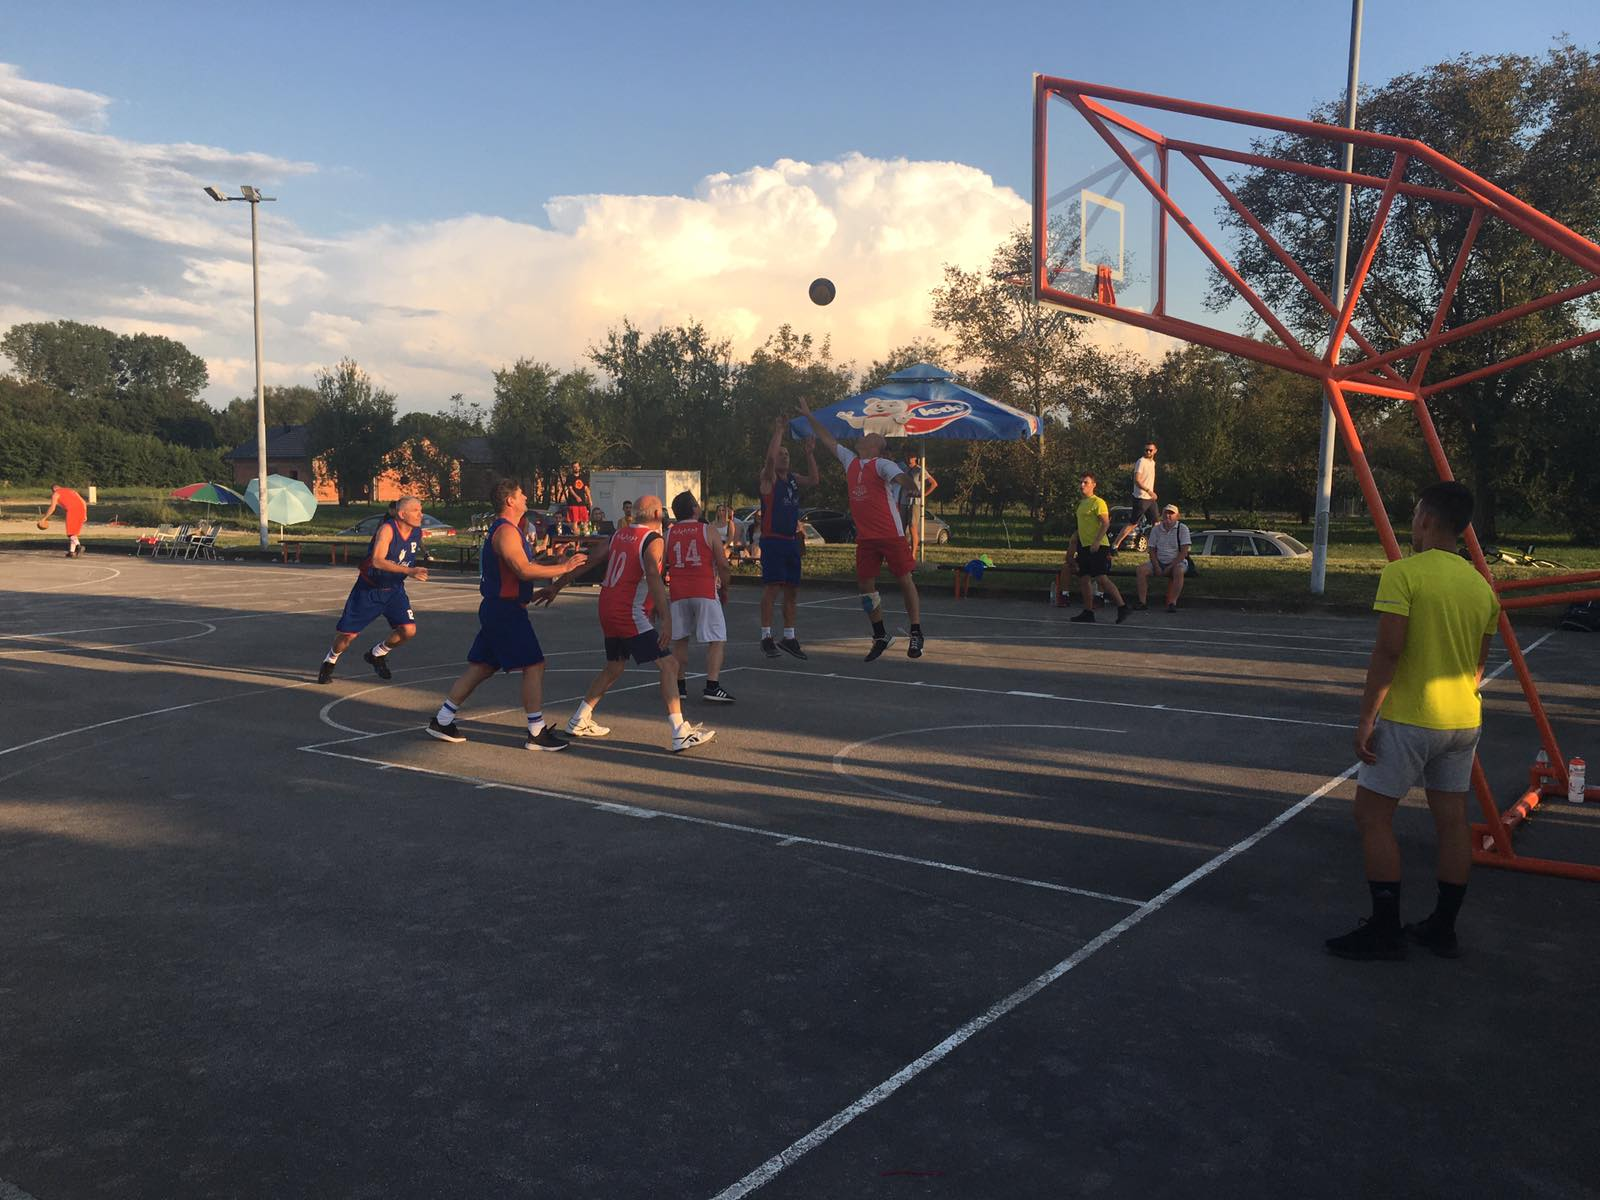 1. prvenstvo Međimurja u streetball-u 9